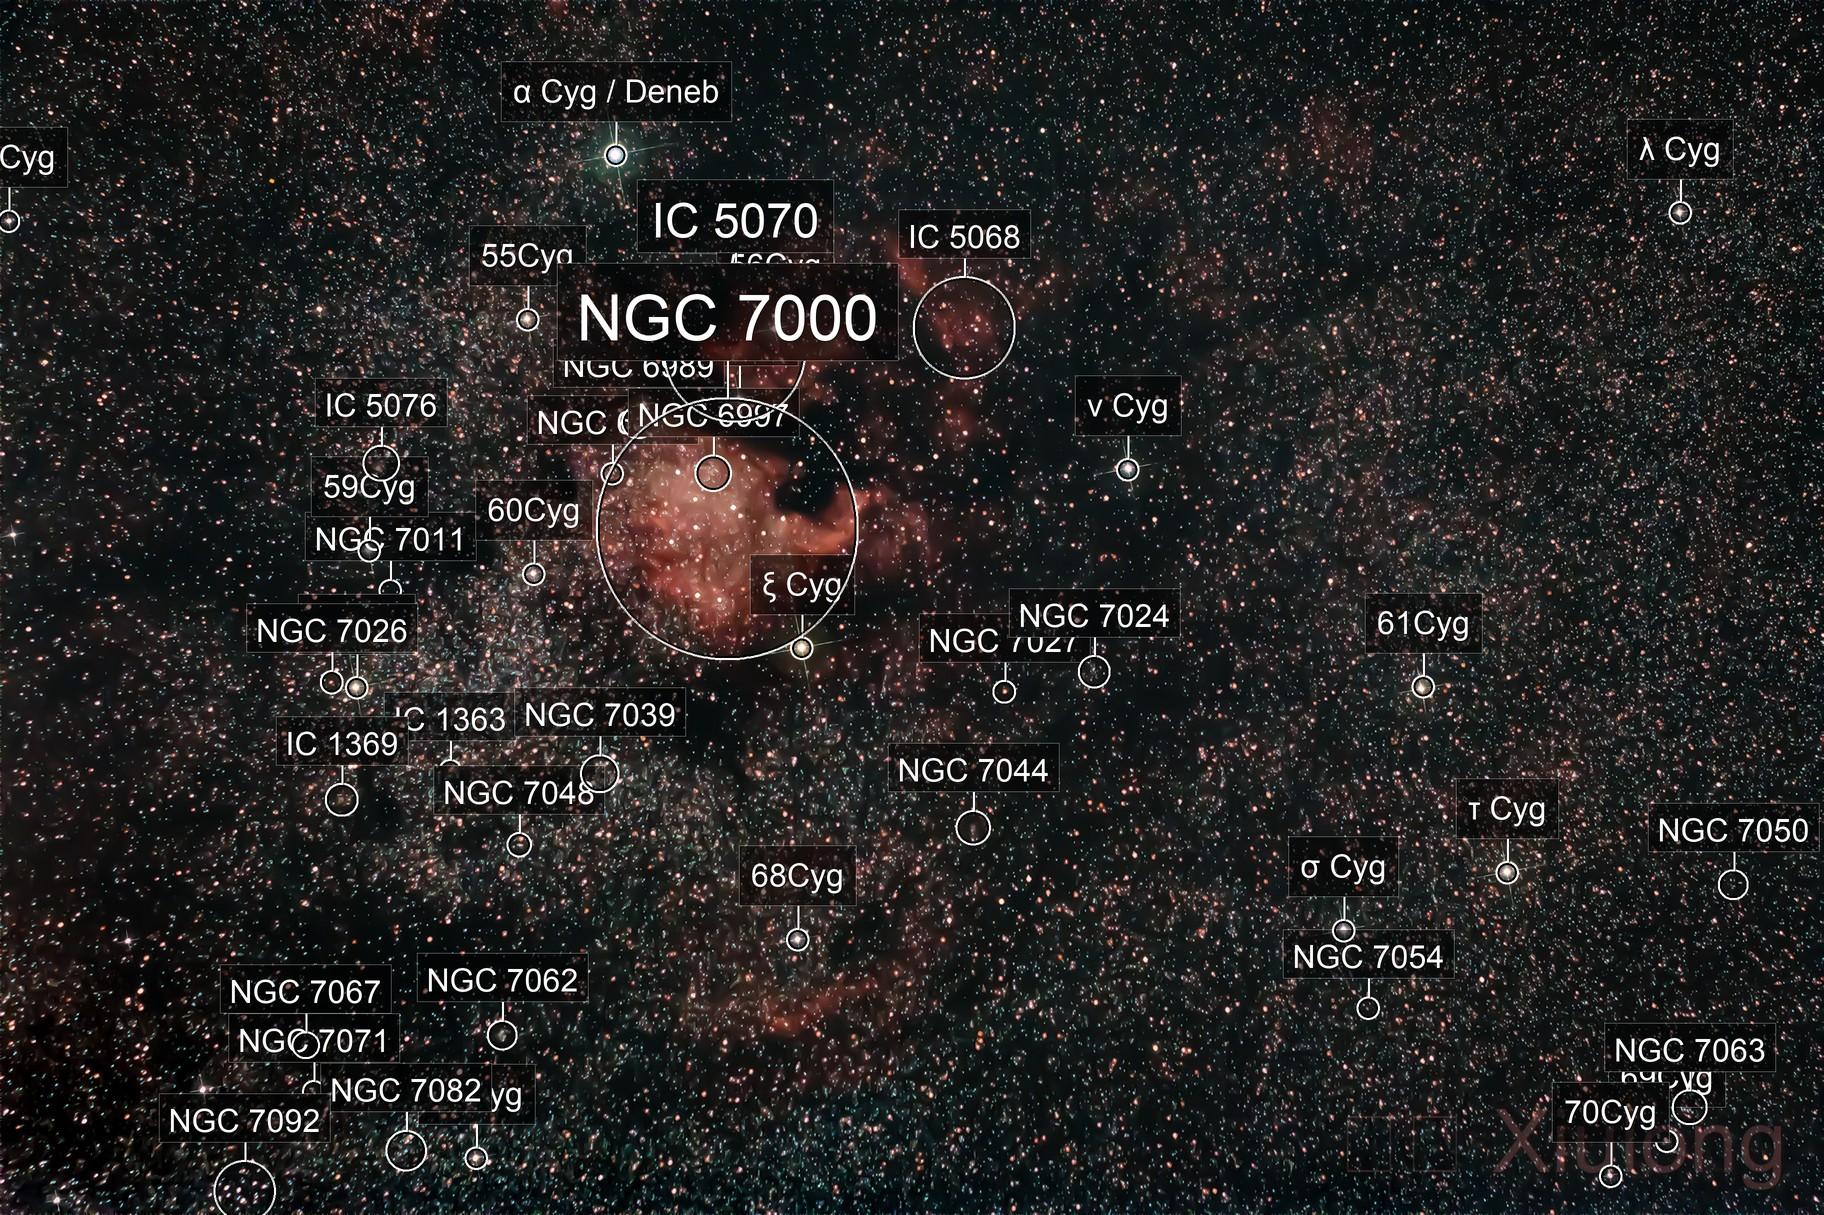 Cygnus, NGC7000, Debeb